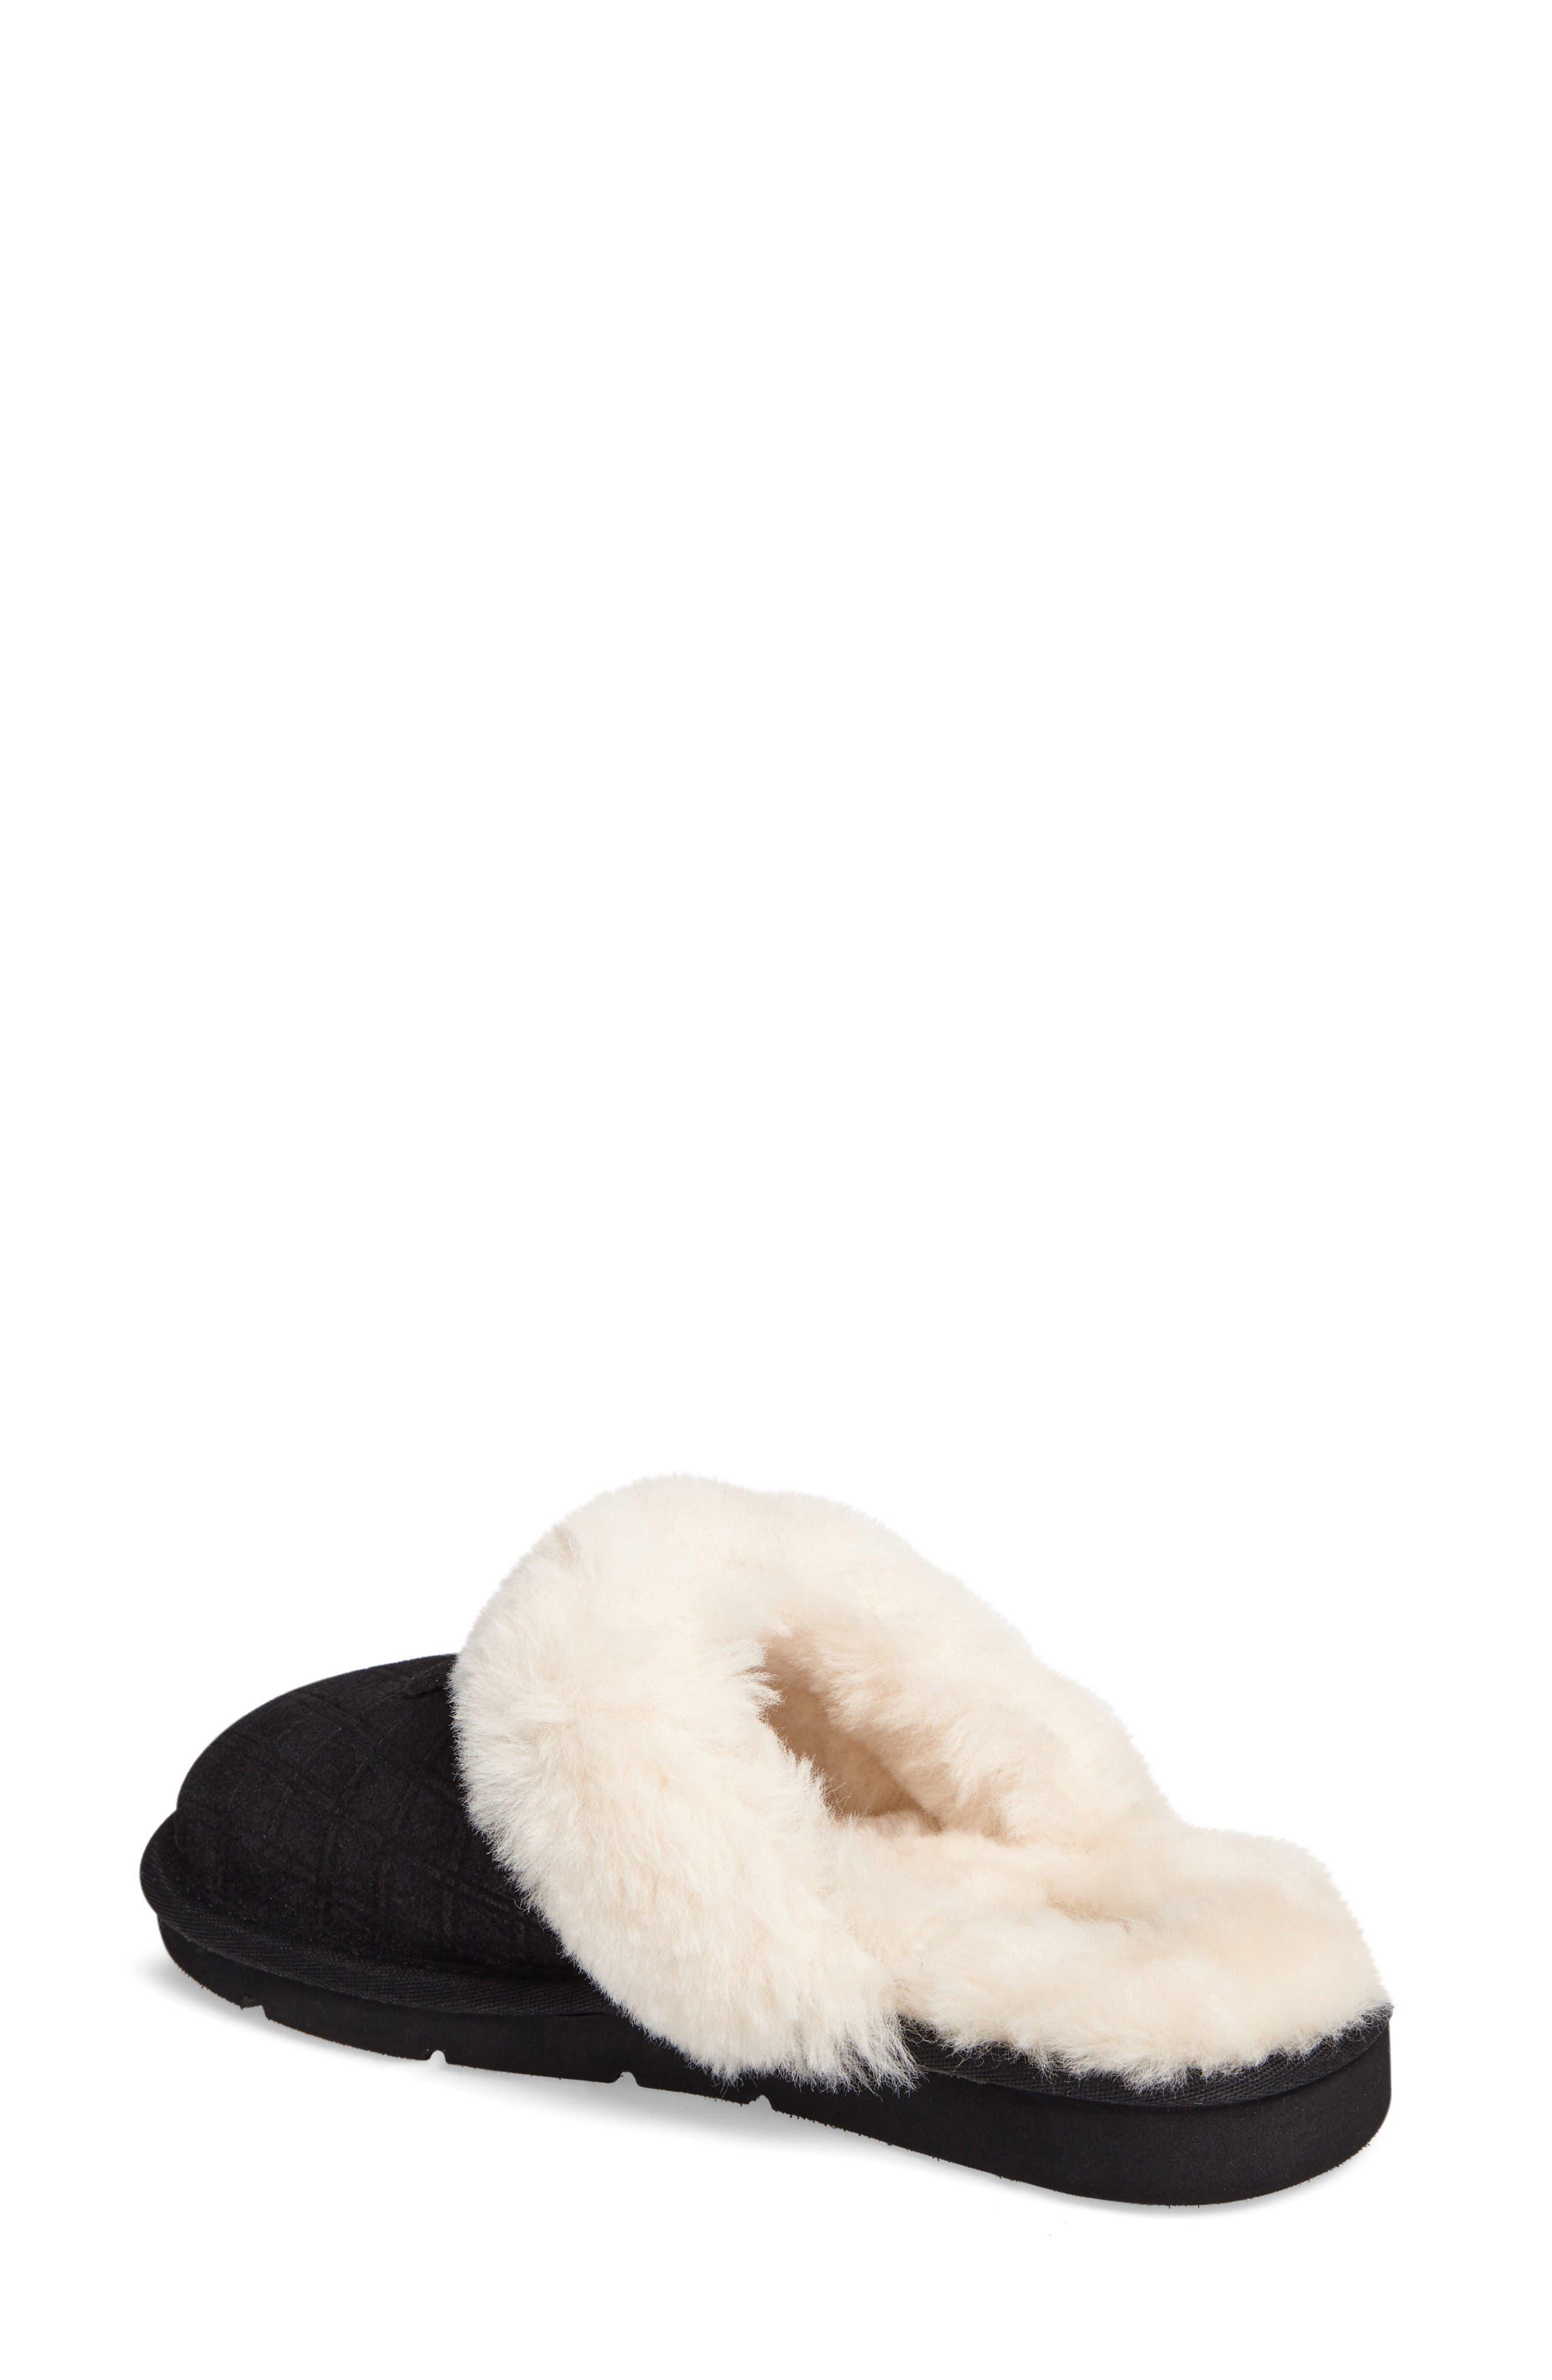 Alternate Image 2  - UGG® Cozy Genuine Shearling Slipper (Women)